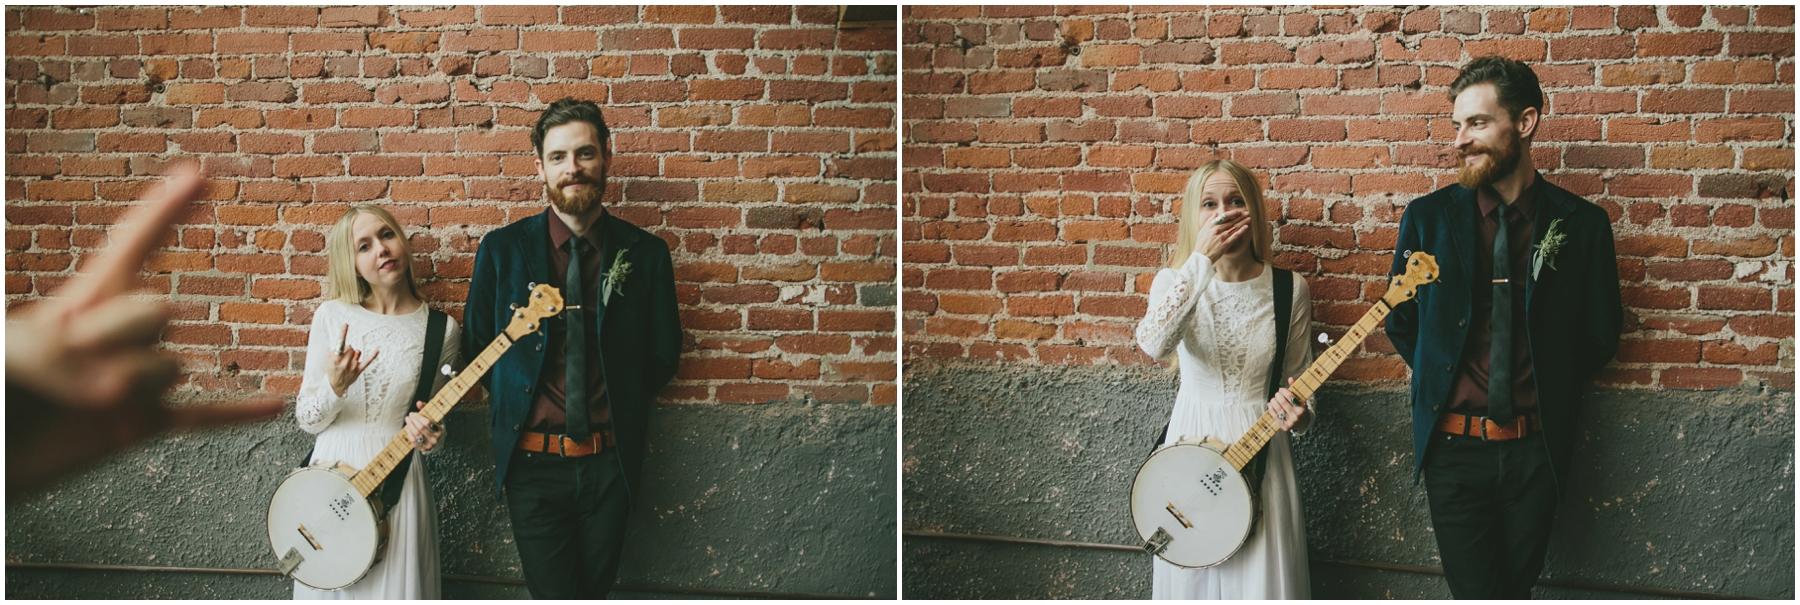 Natalie+Corey-WEDDING_KELLYBOITANO_0055